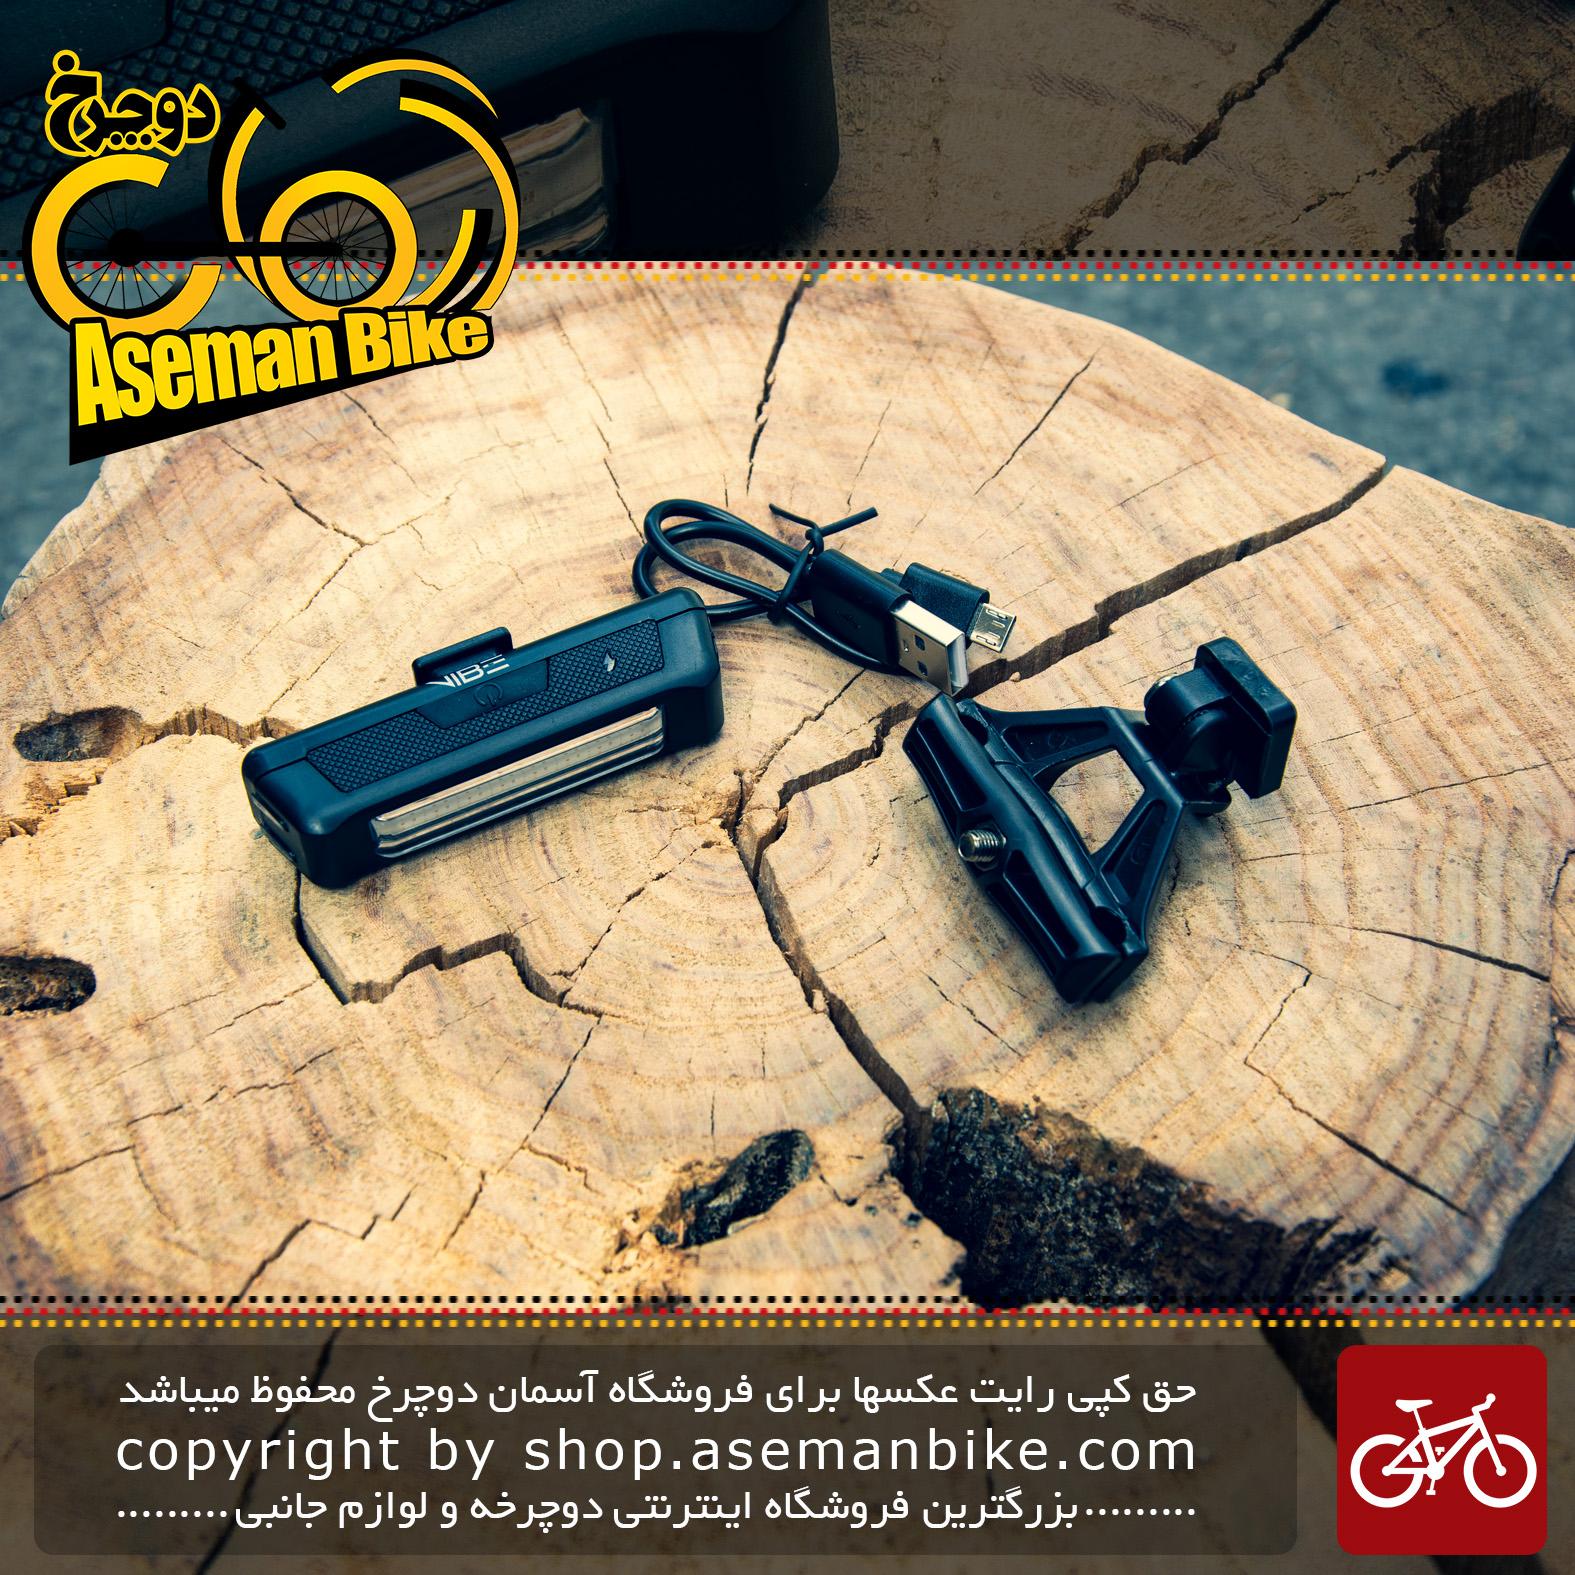 چراغ دوچرخه برند وایب قابل شارژ مدل وی بی 0020 Bicycle Light Vibe Brand Colorful Rechargeable VB0020